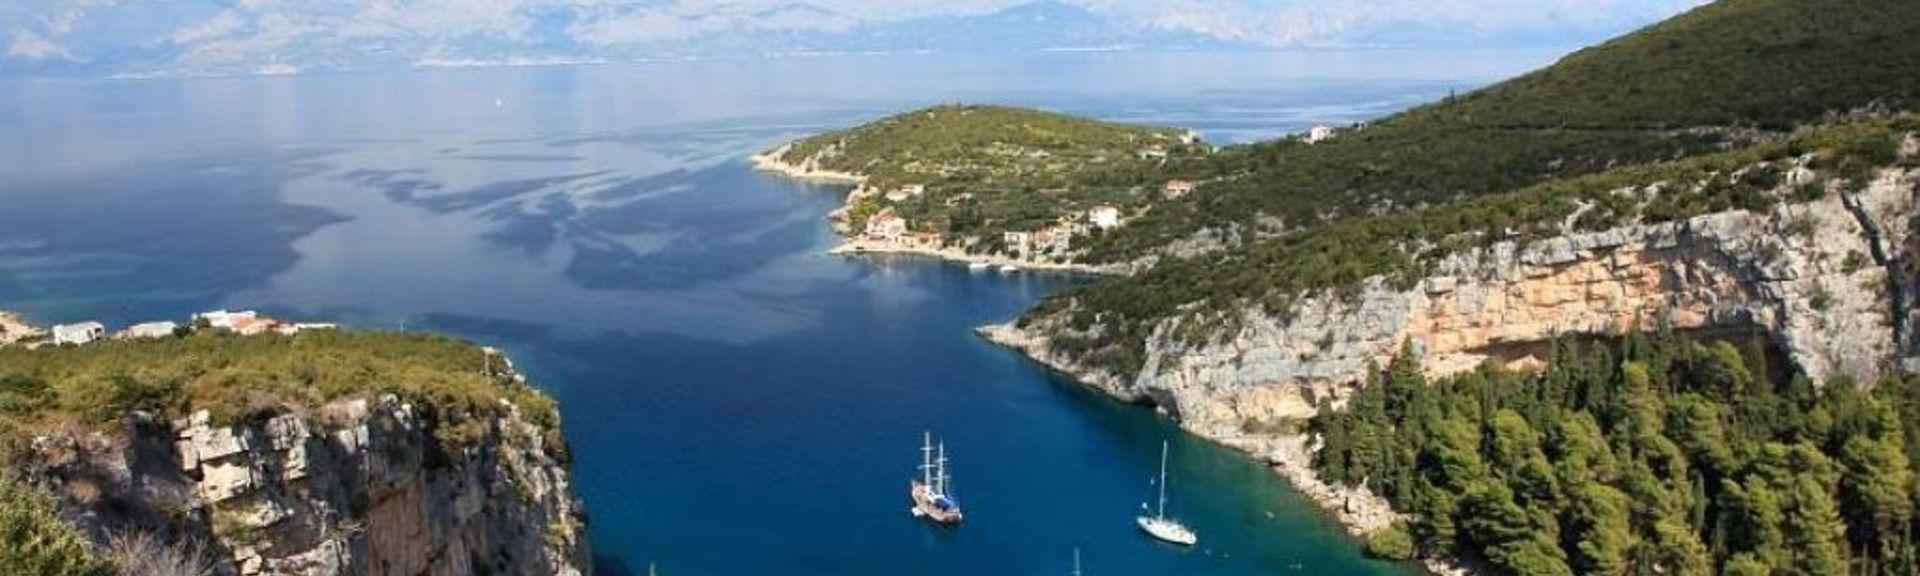 Pokrivenik, Gdinj, Jelsa, Split-Dalmatia, Croatia